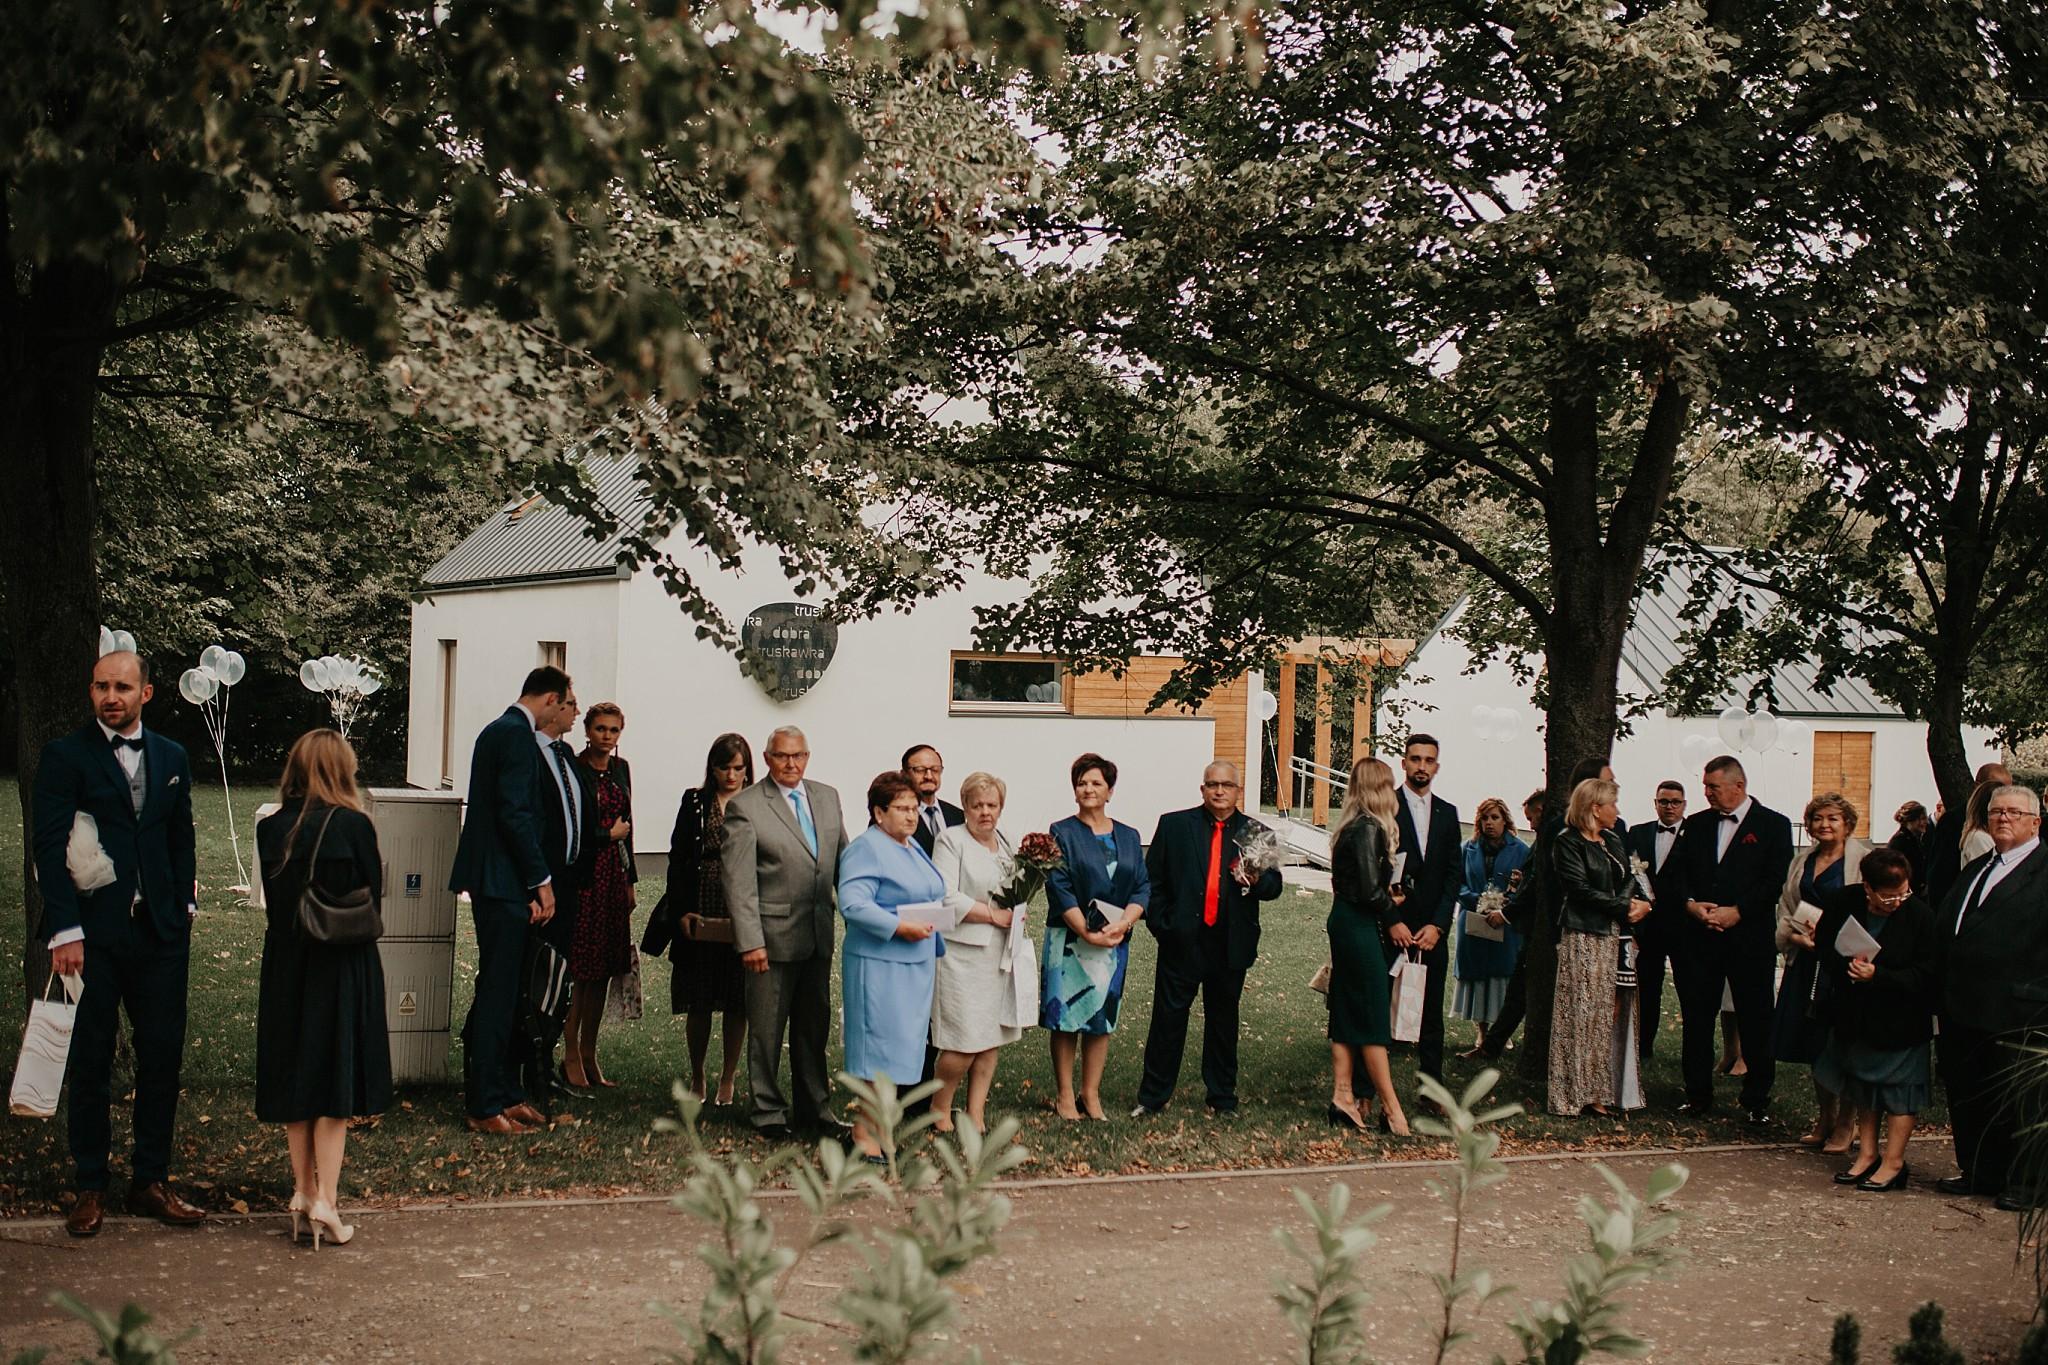 fotograf poznan wesele dobra truskawka piekne wesele pod poznaniem wesele w dobrej truskawce piekna para mloda slub marzen slub koronawirus slub listopad wesele koronawirus 257